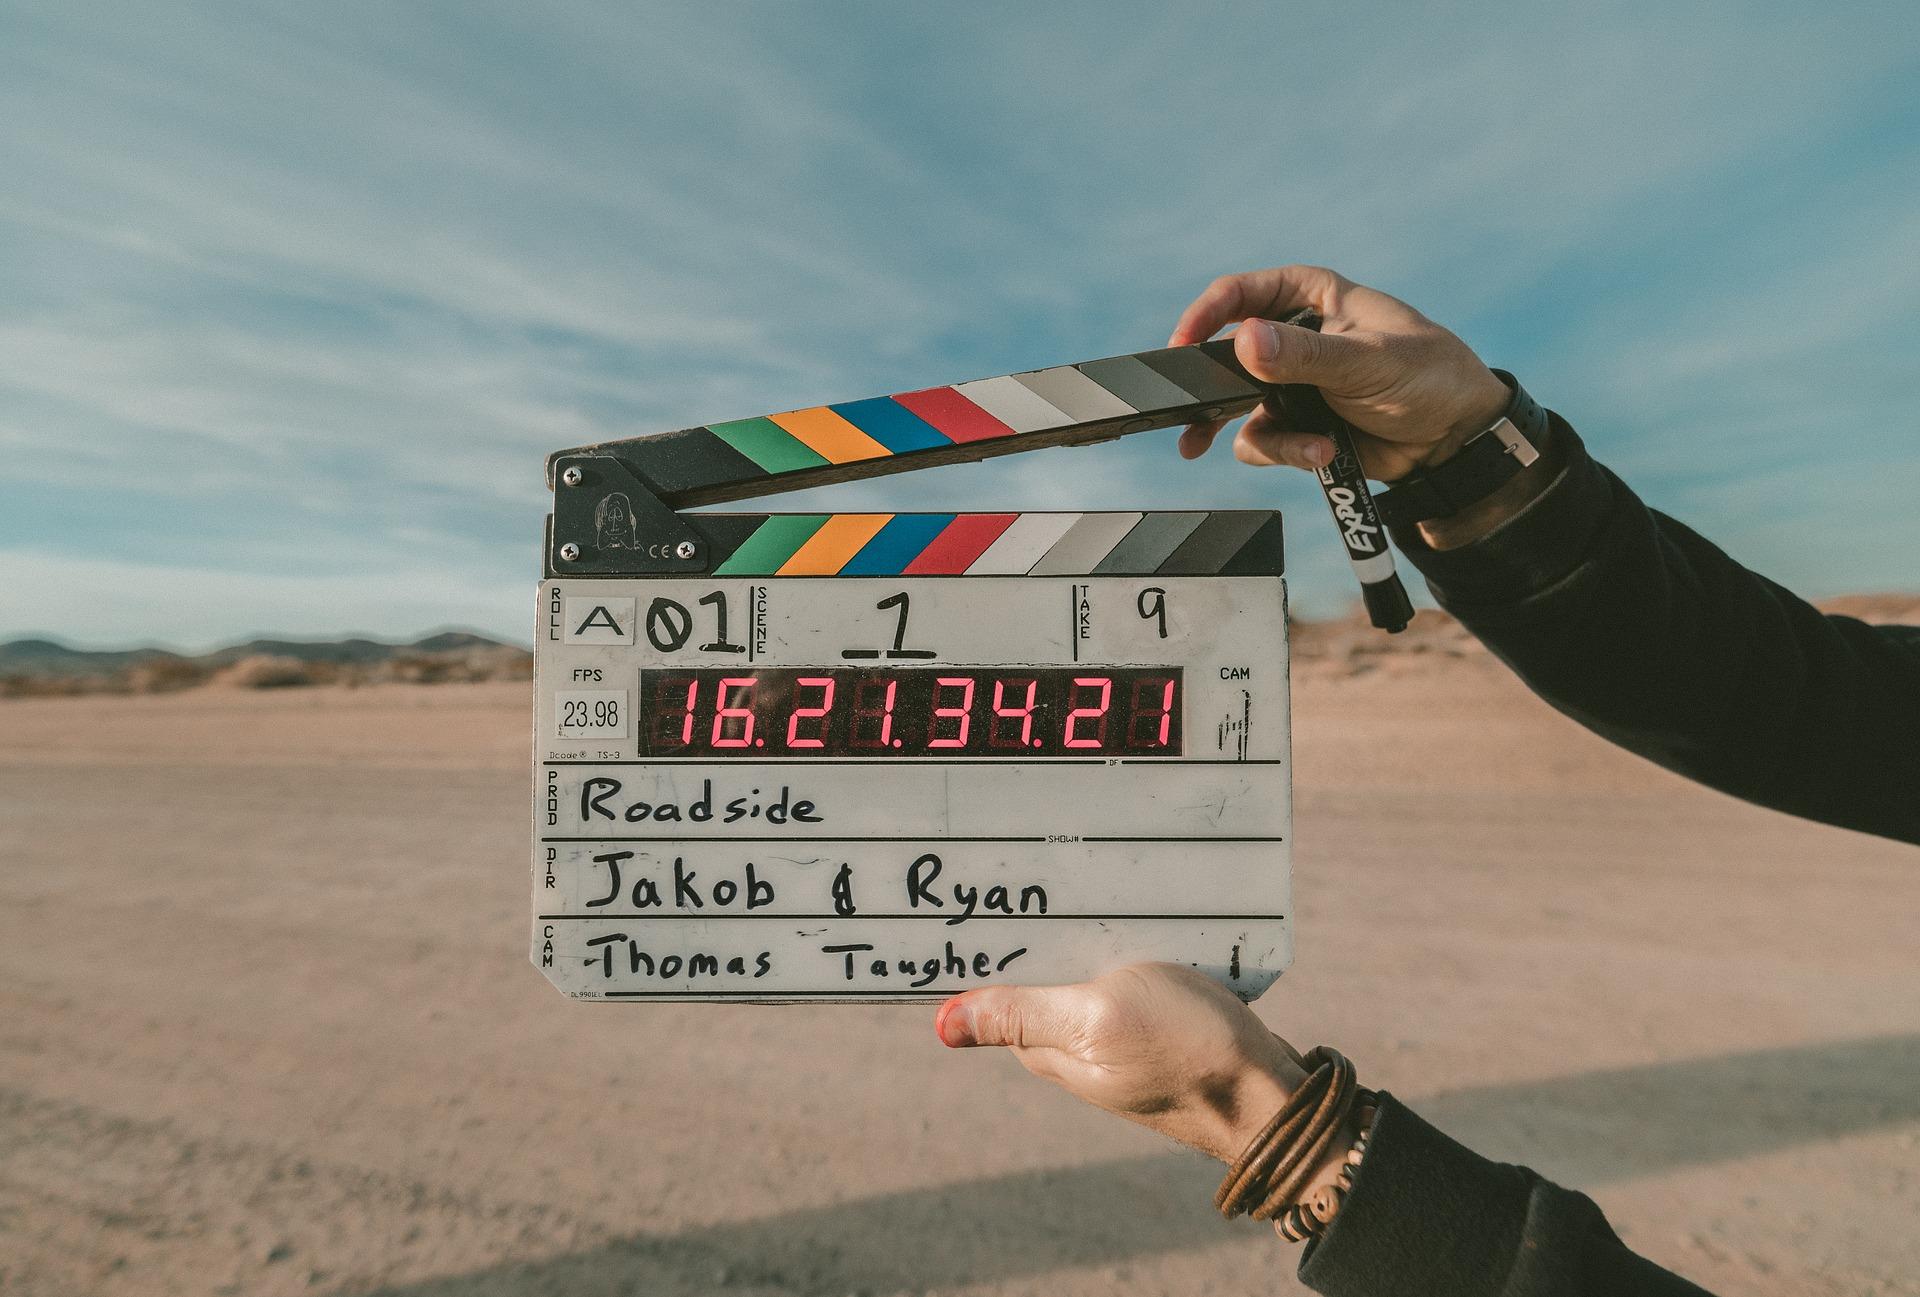 filmer 2021